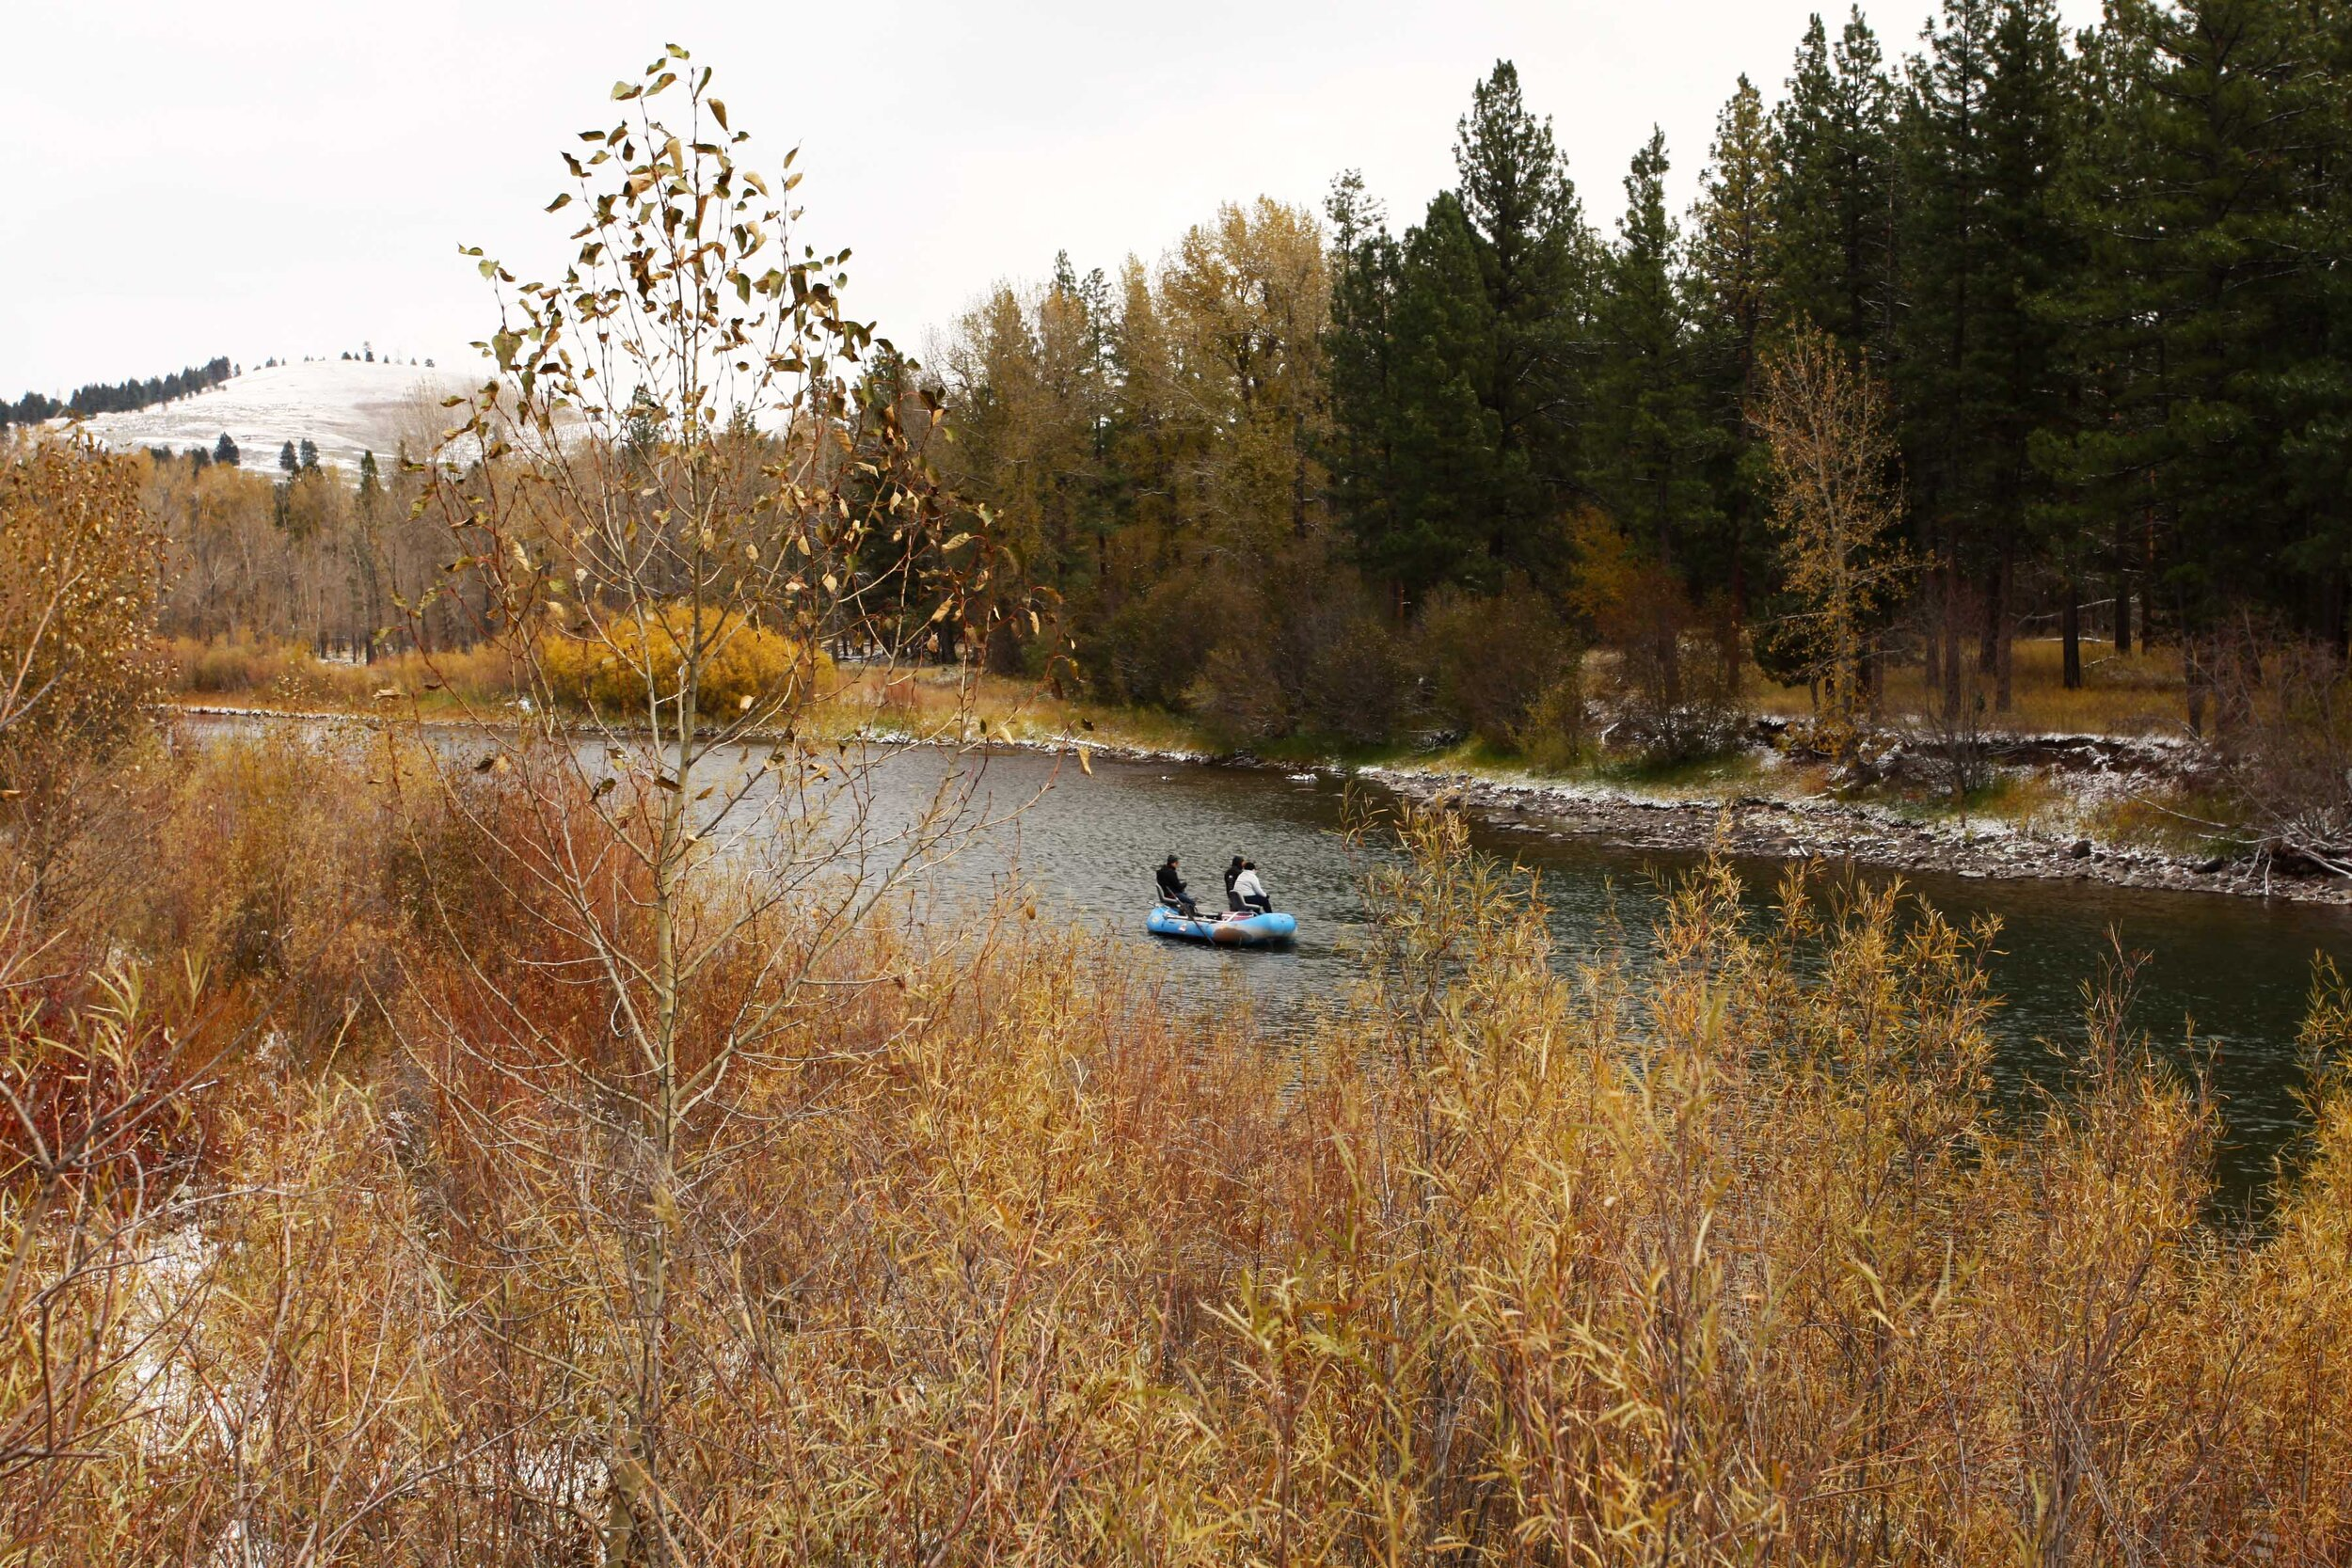 Fly fishing on the Blackfoot.